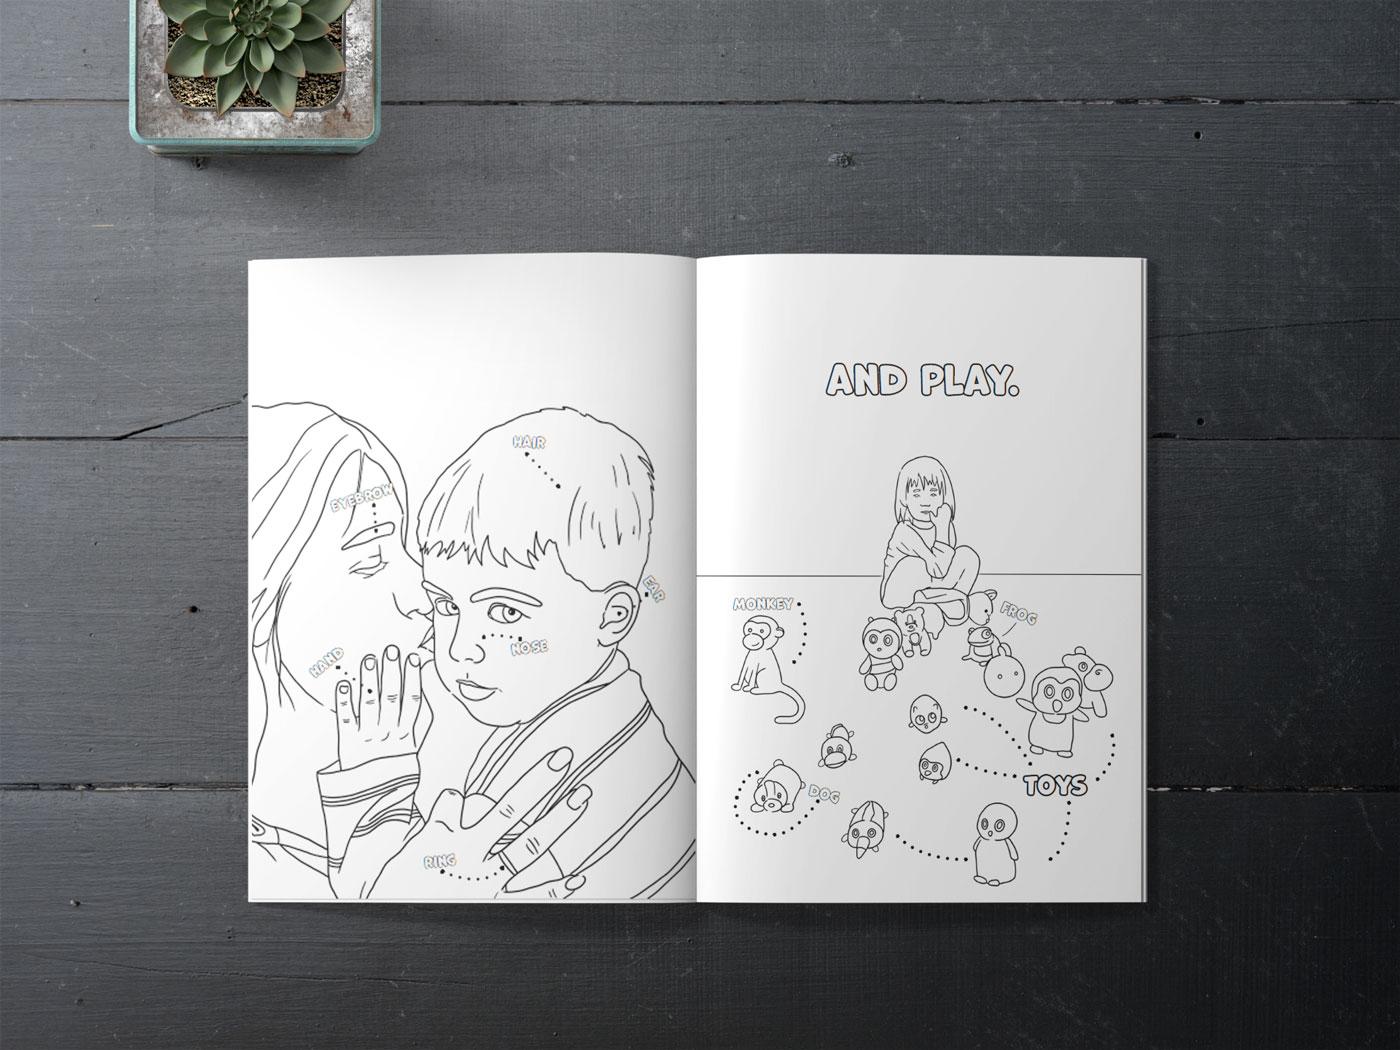 spalvinimo knyga su musu foto